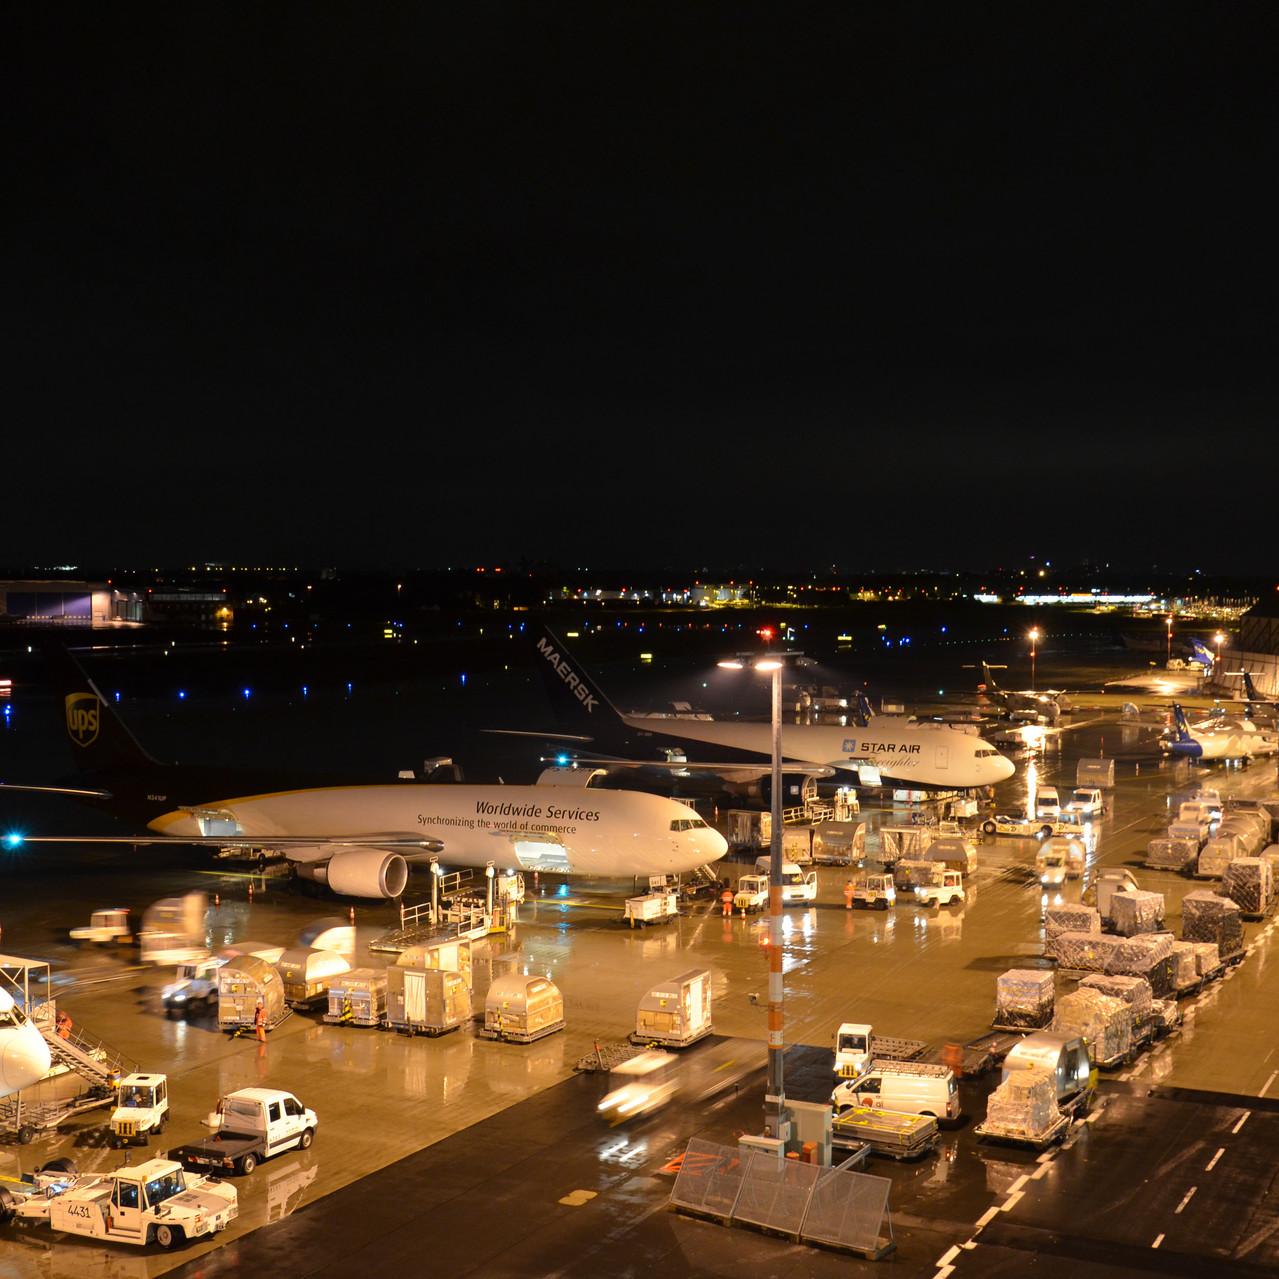 Cologne Bonn_PR image_012_cargo